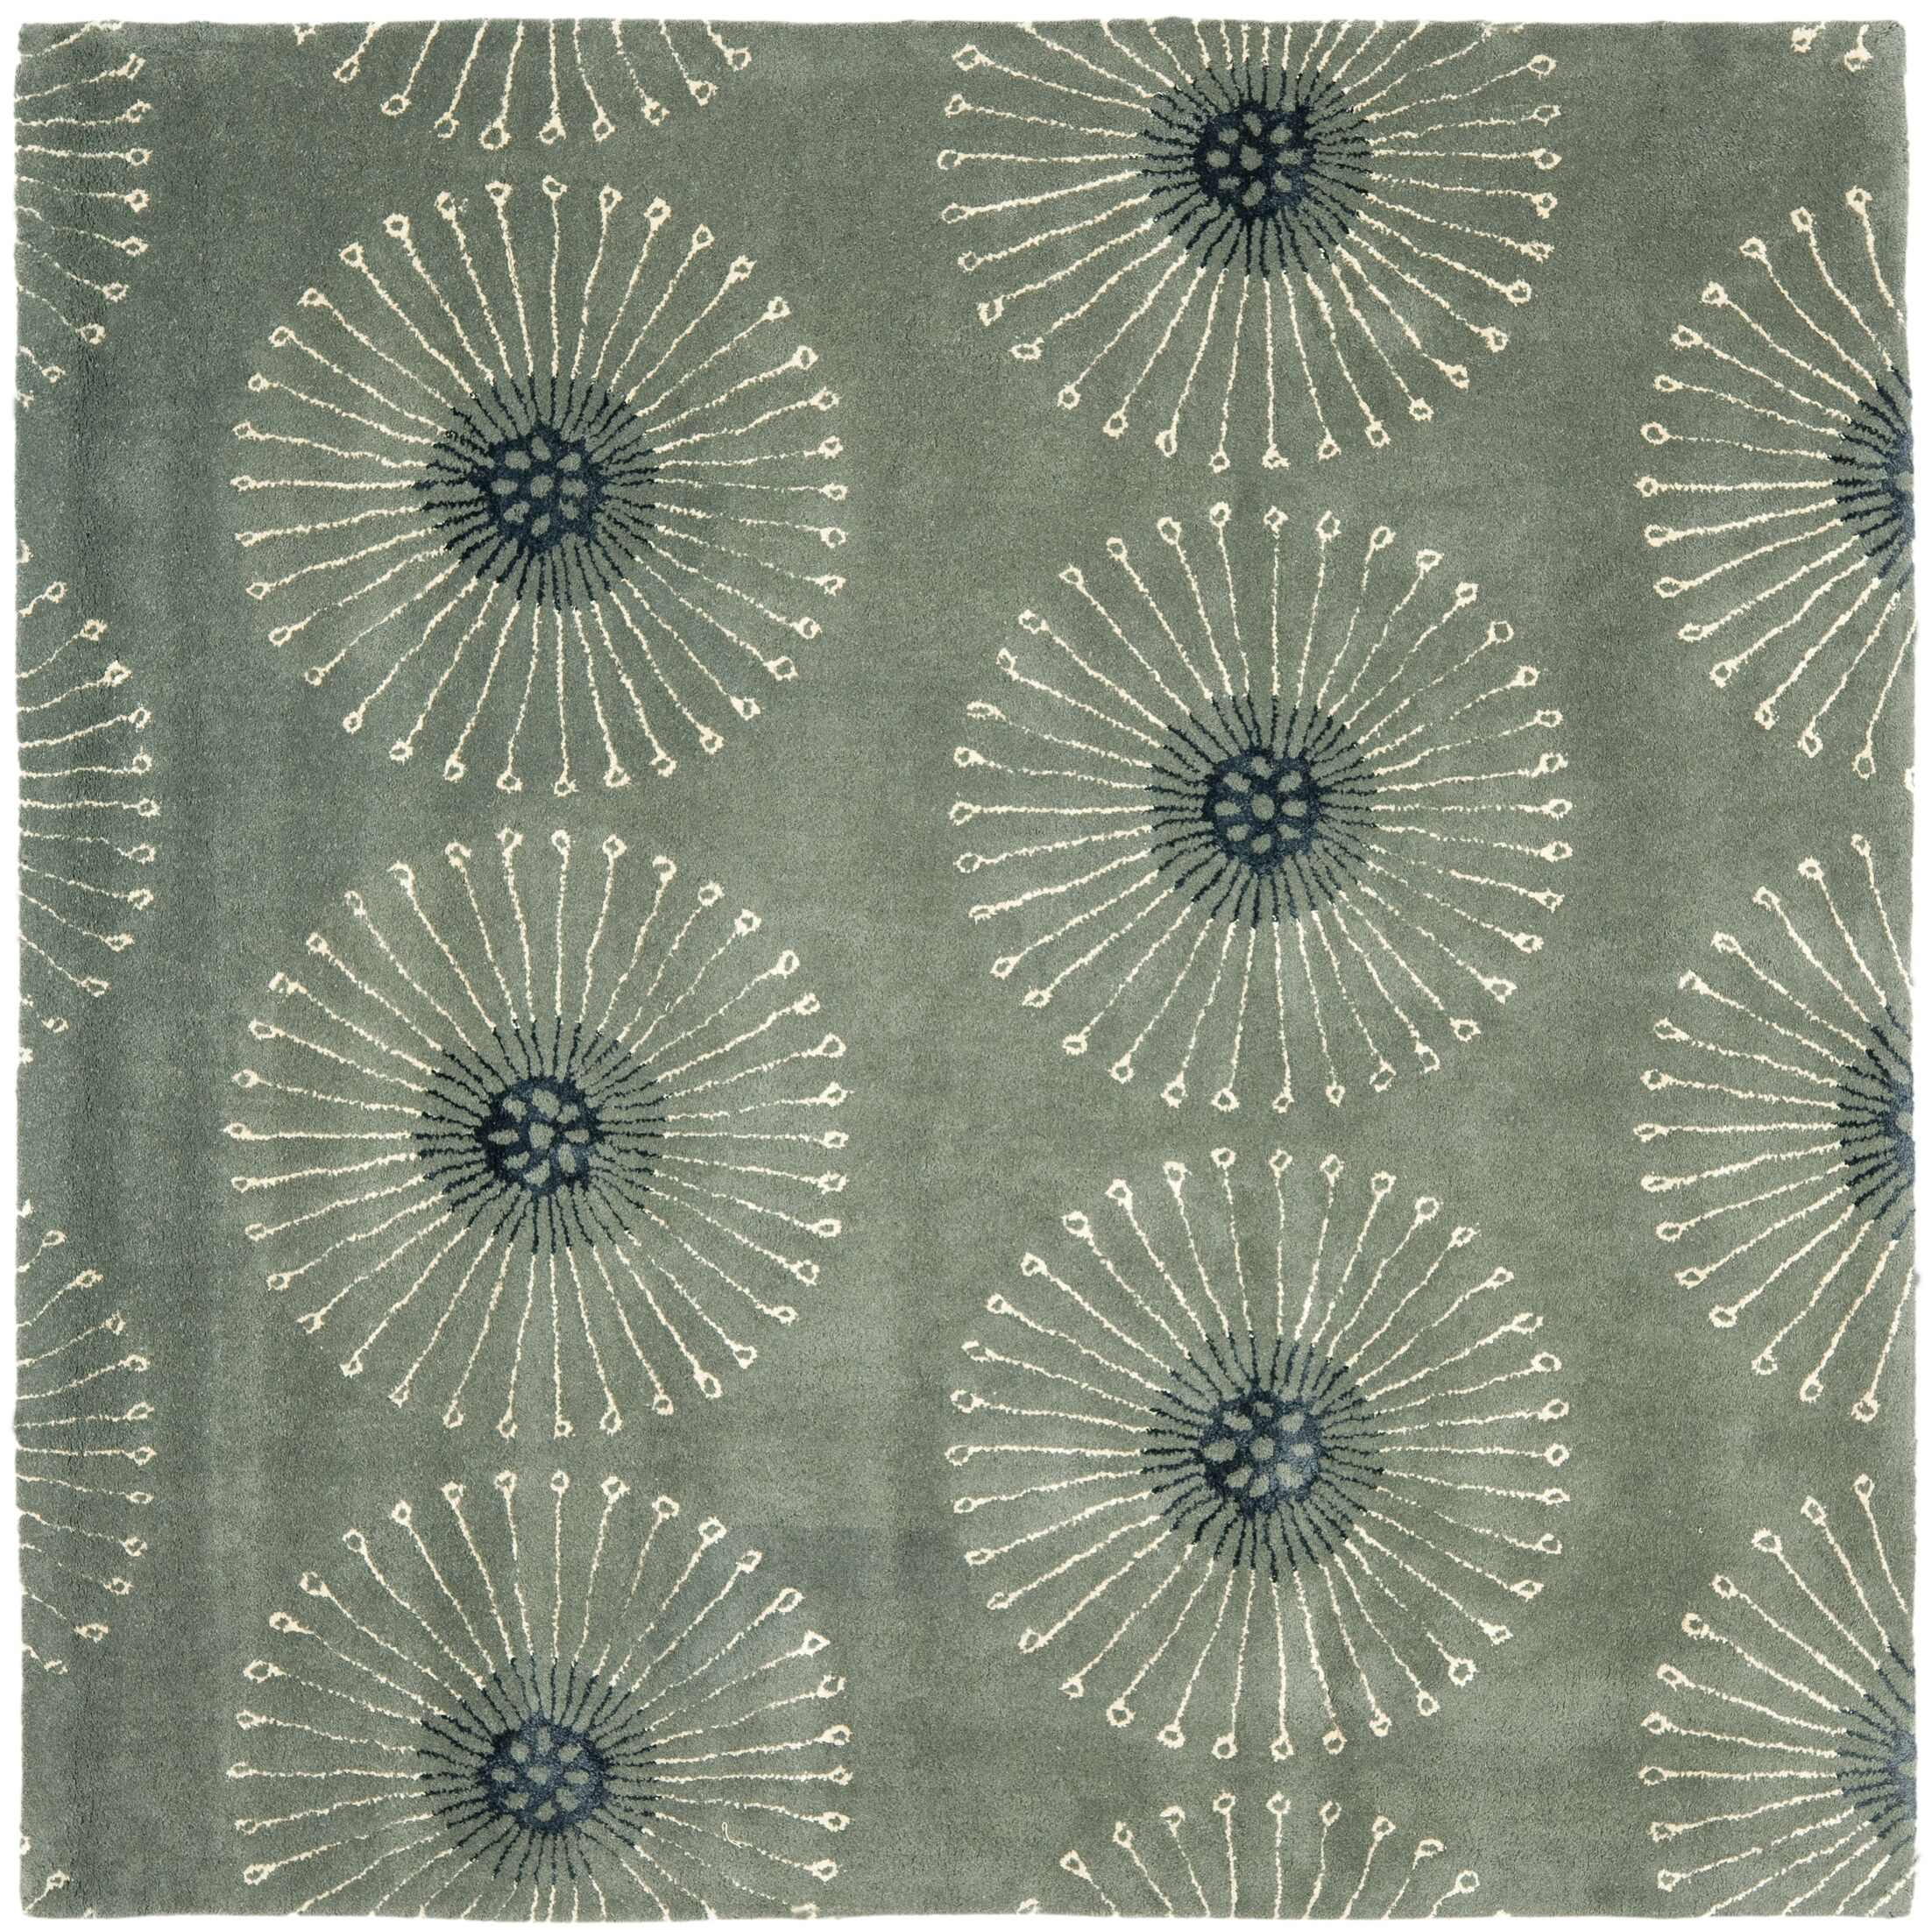 Lockwood Gray/Ivory Area Rug Rug Size: Square 6'